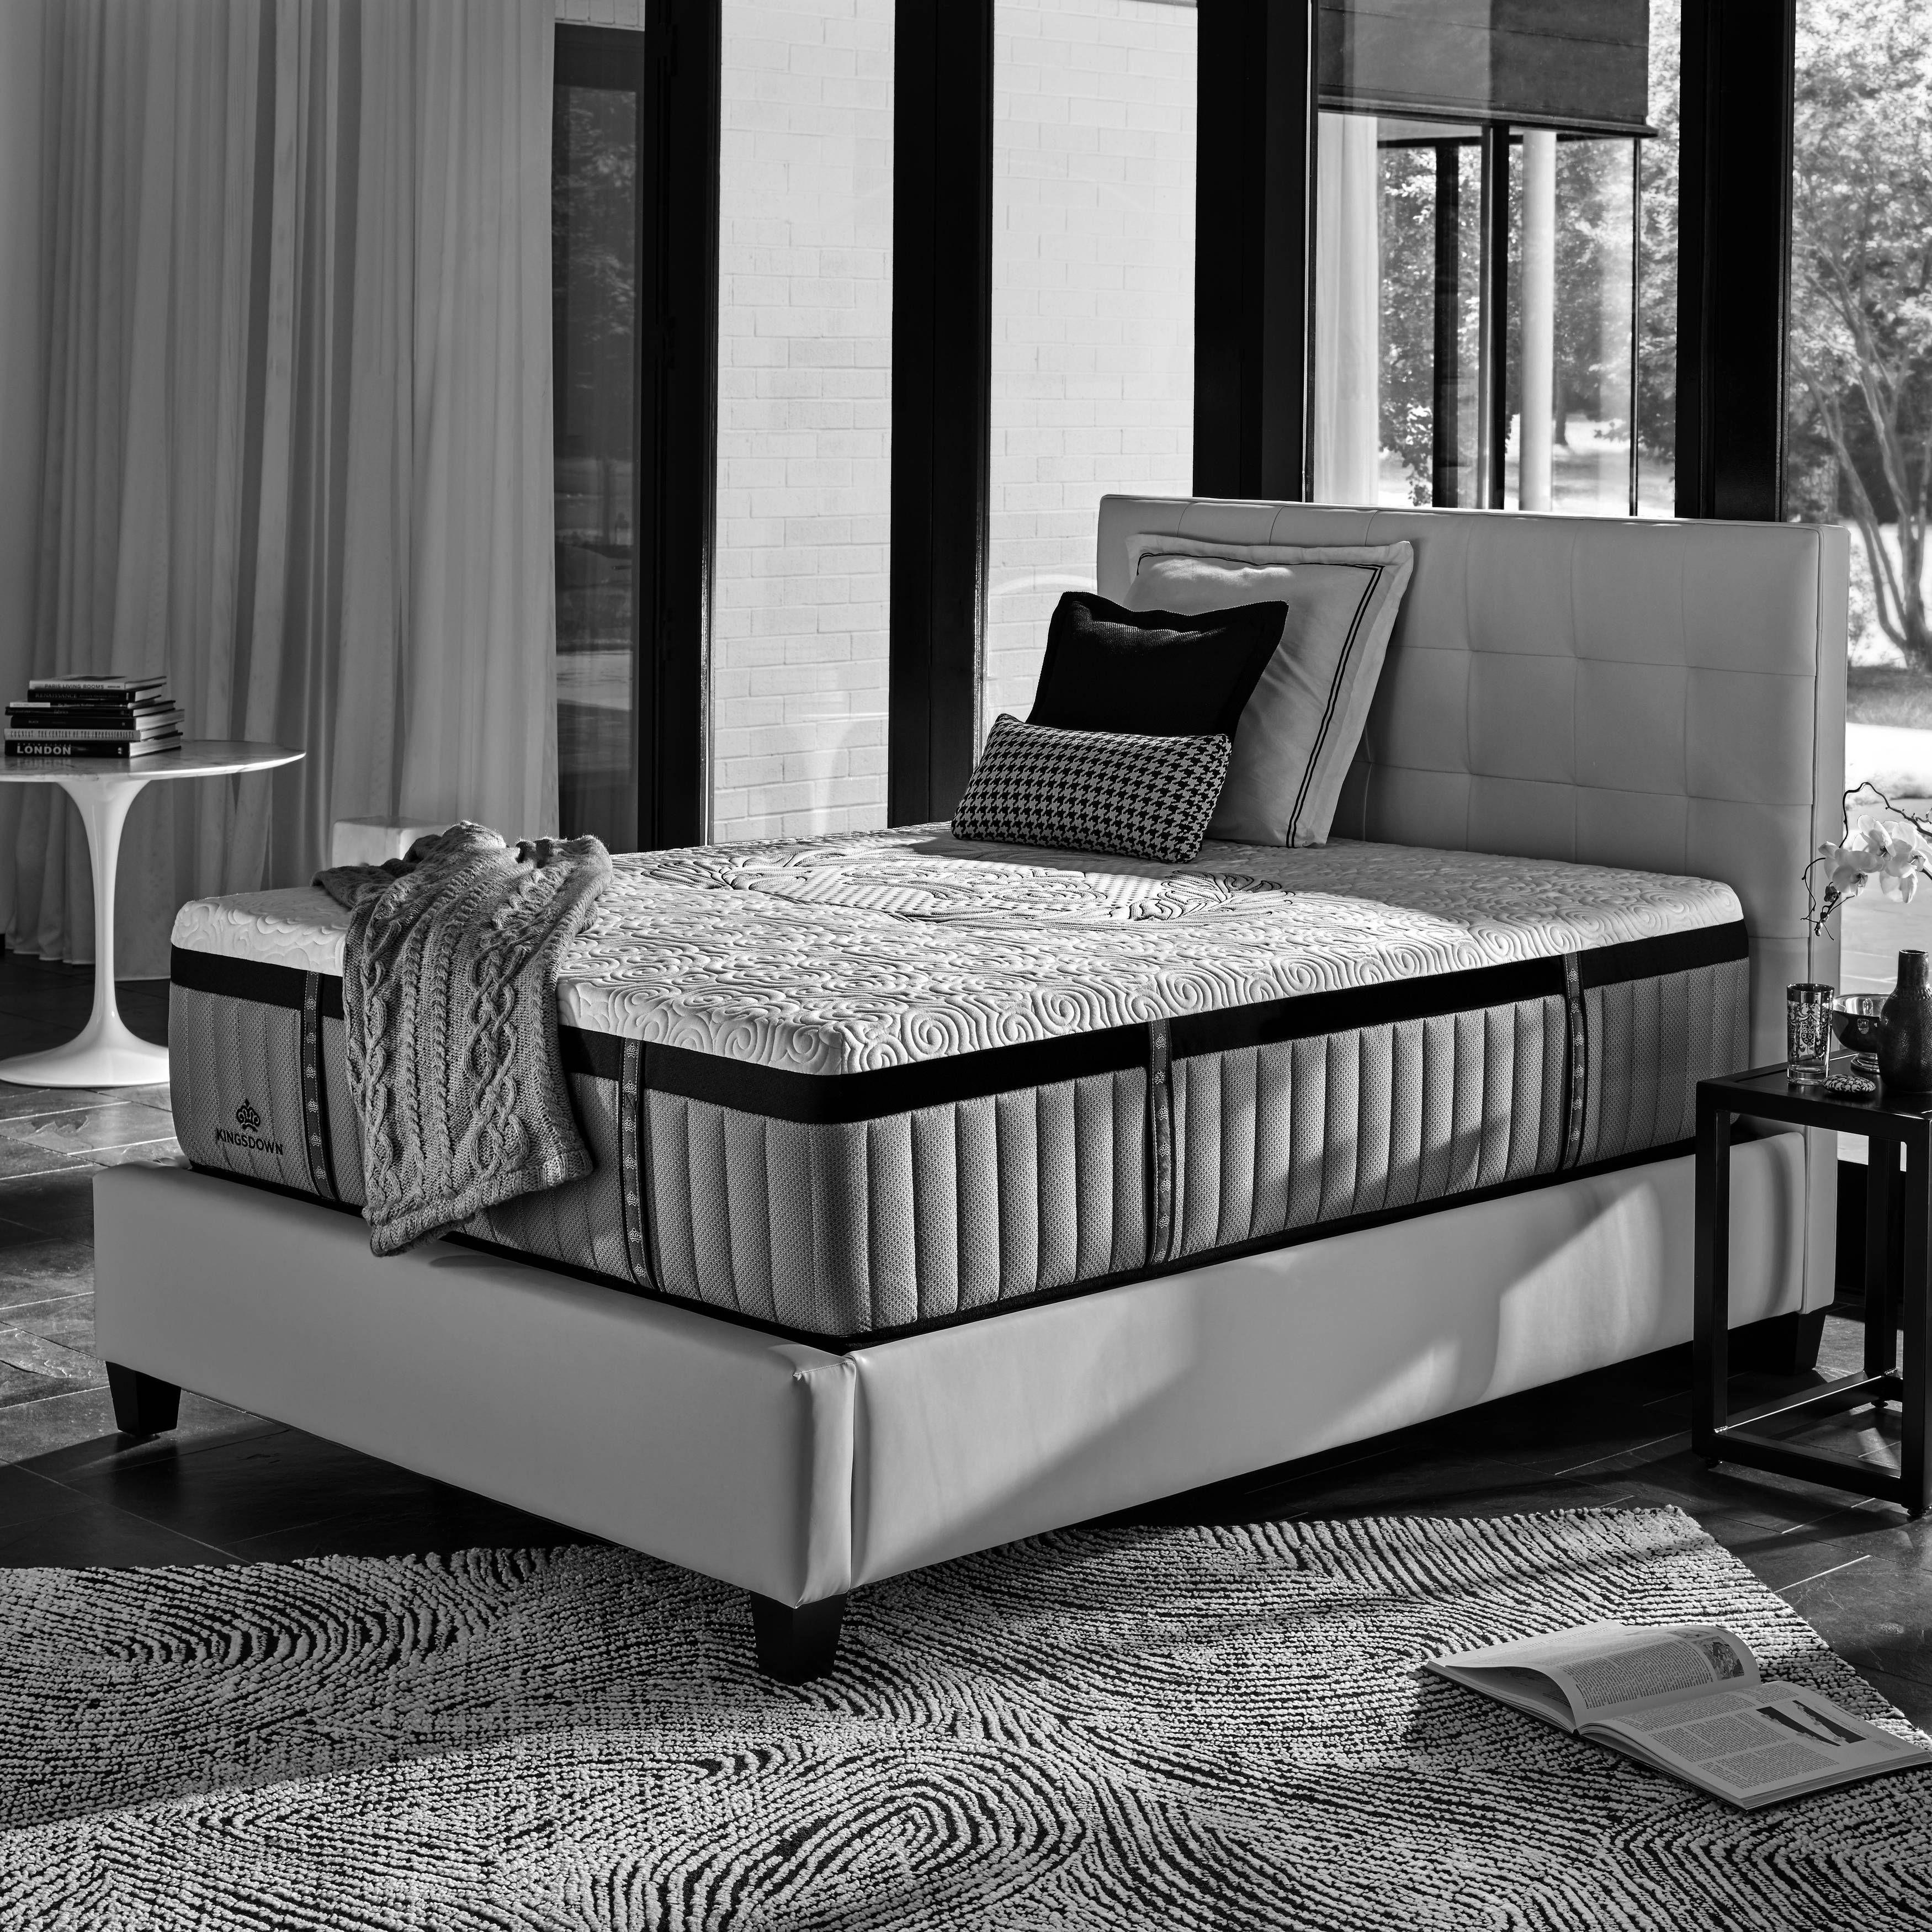 kingsdown crown imperial crest 15 inch king luxury hybrid mattress